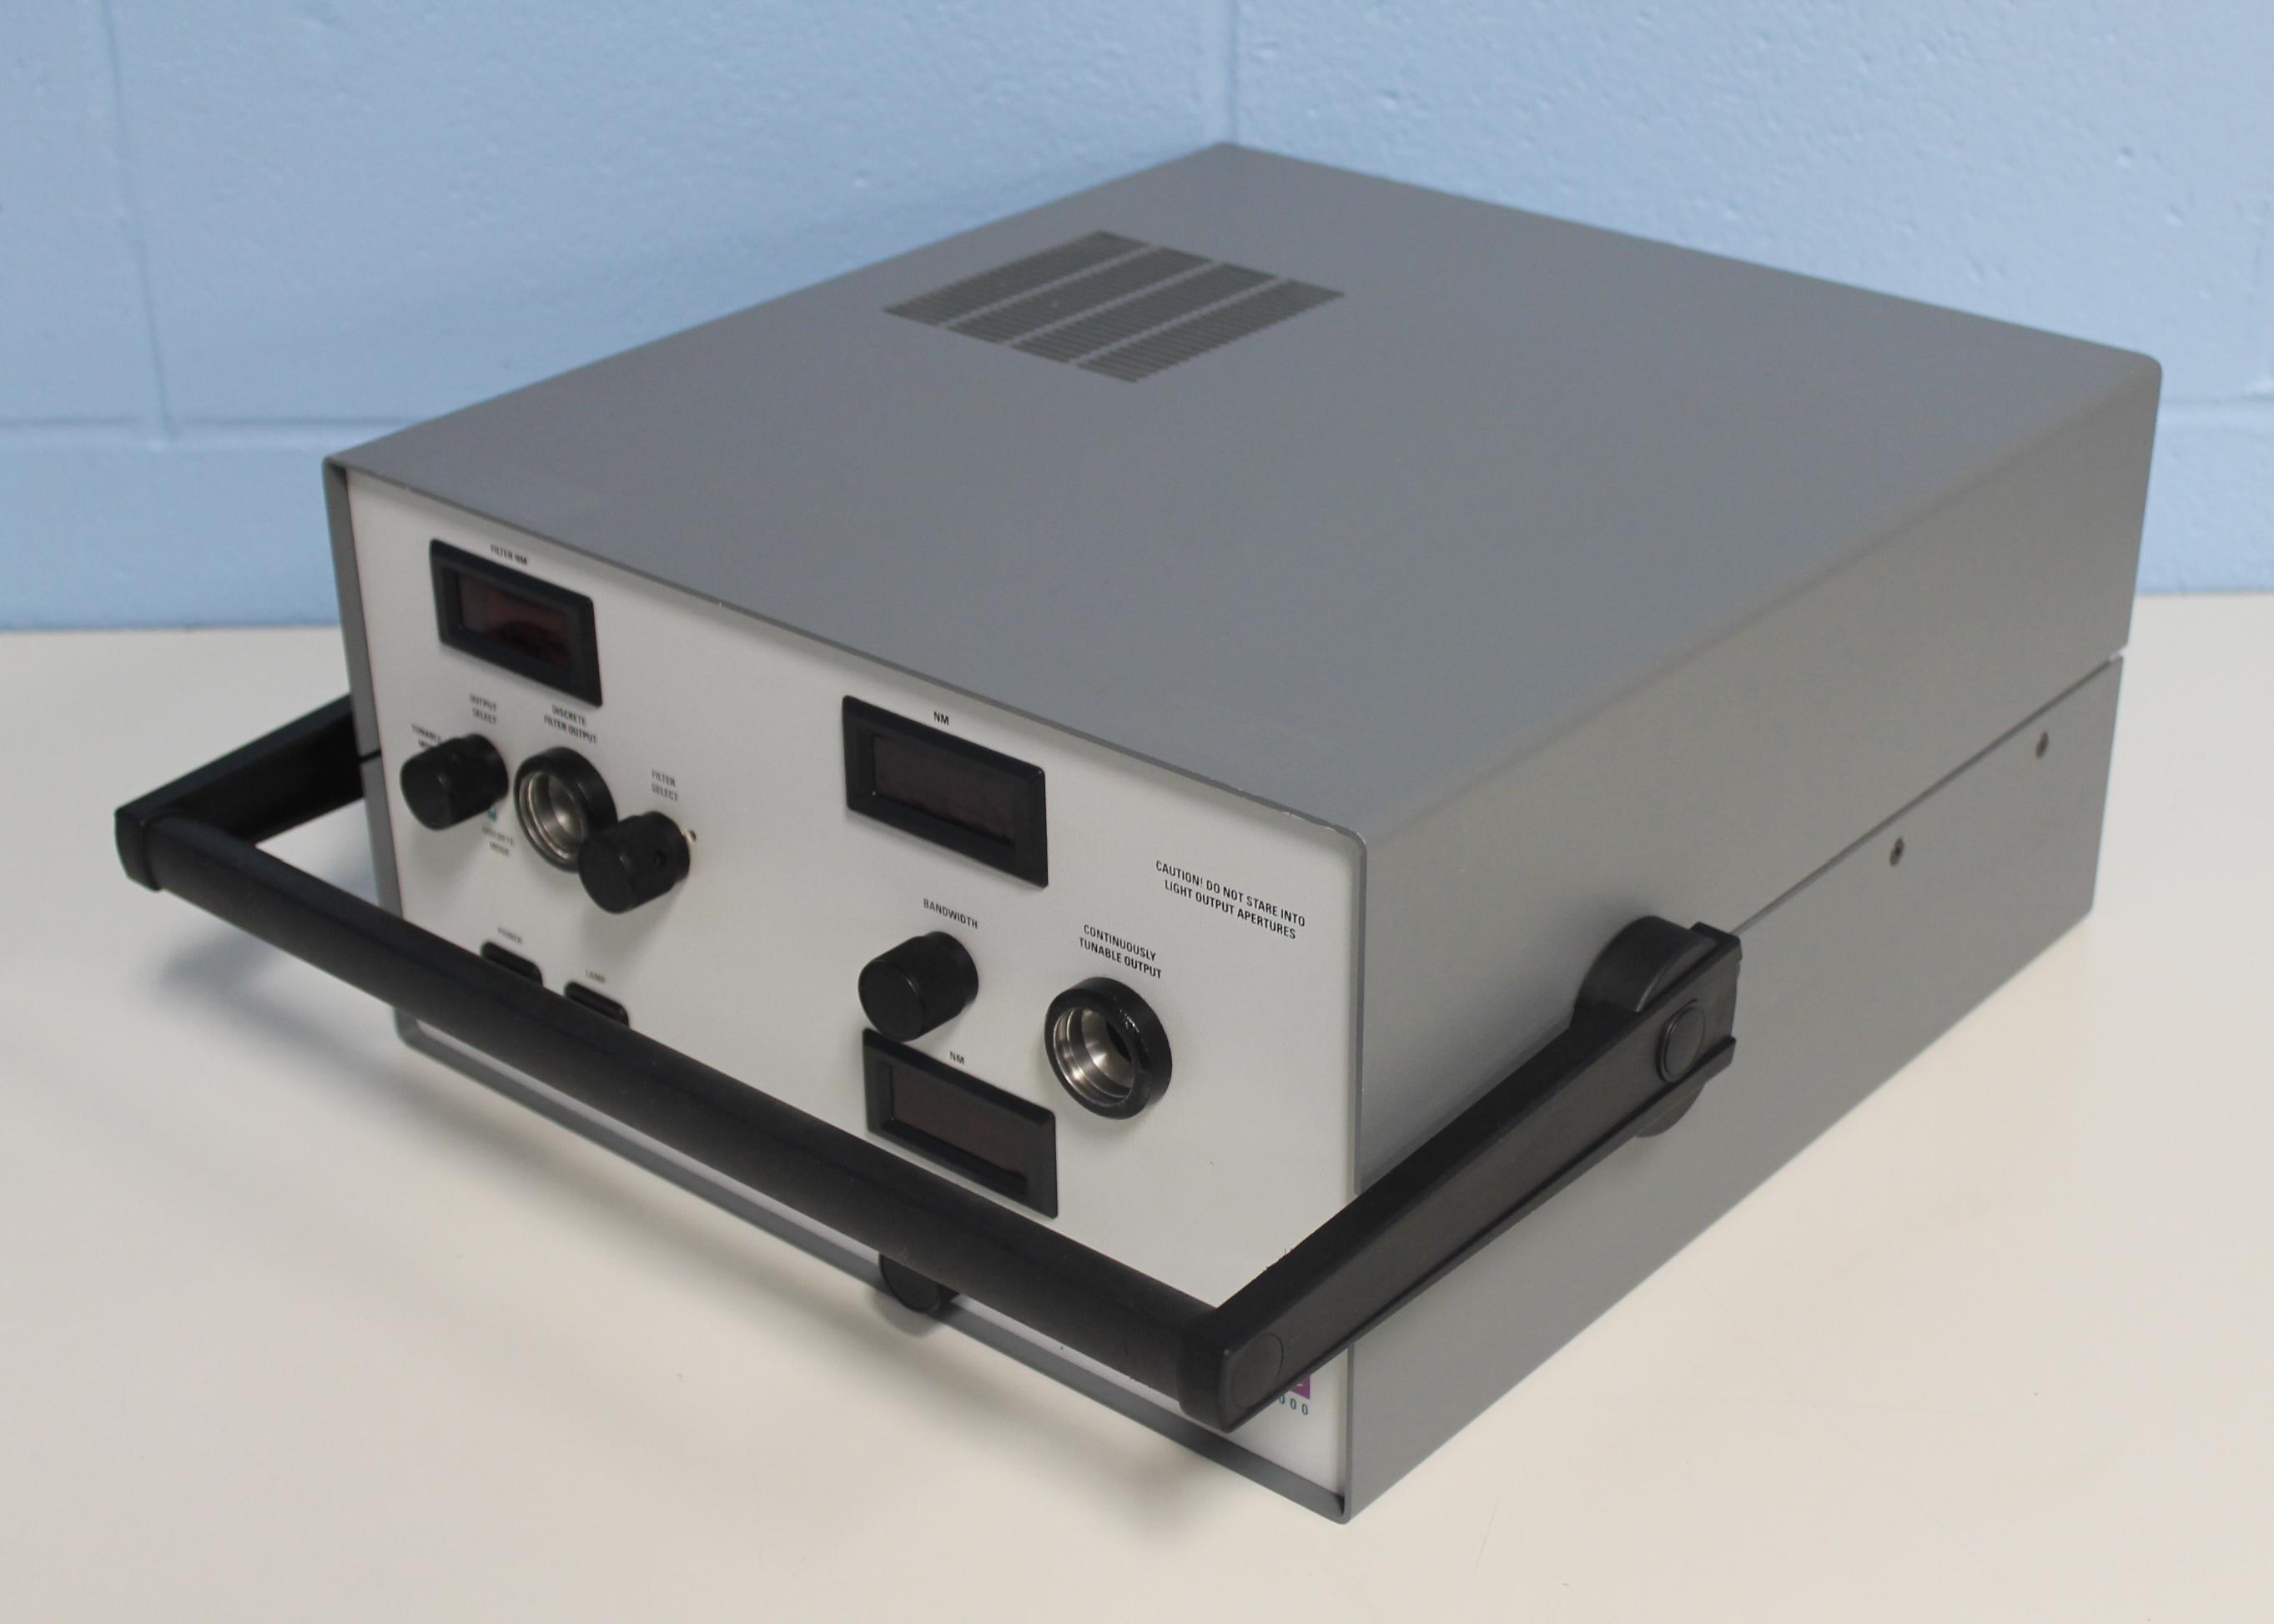 Refurbished Omnichrome Spectrum 9000 With Case Model Sp